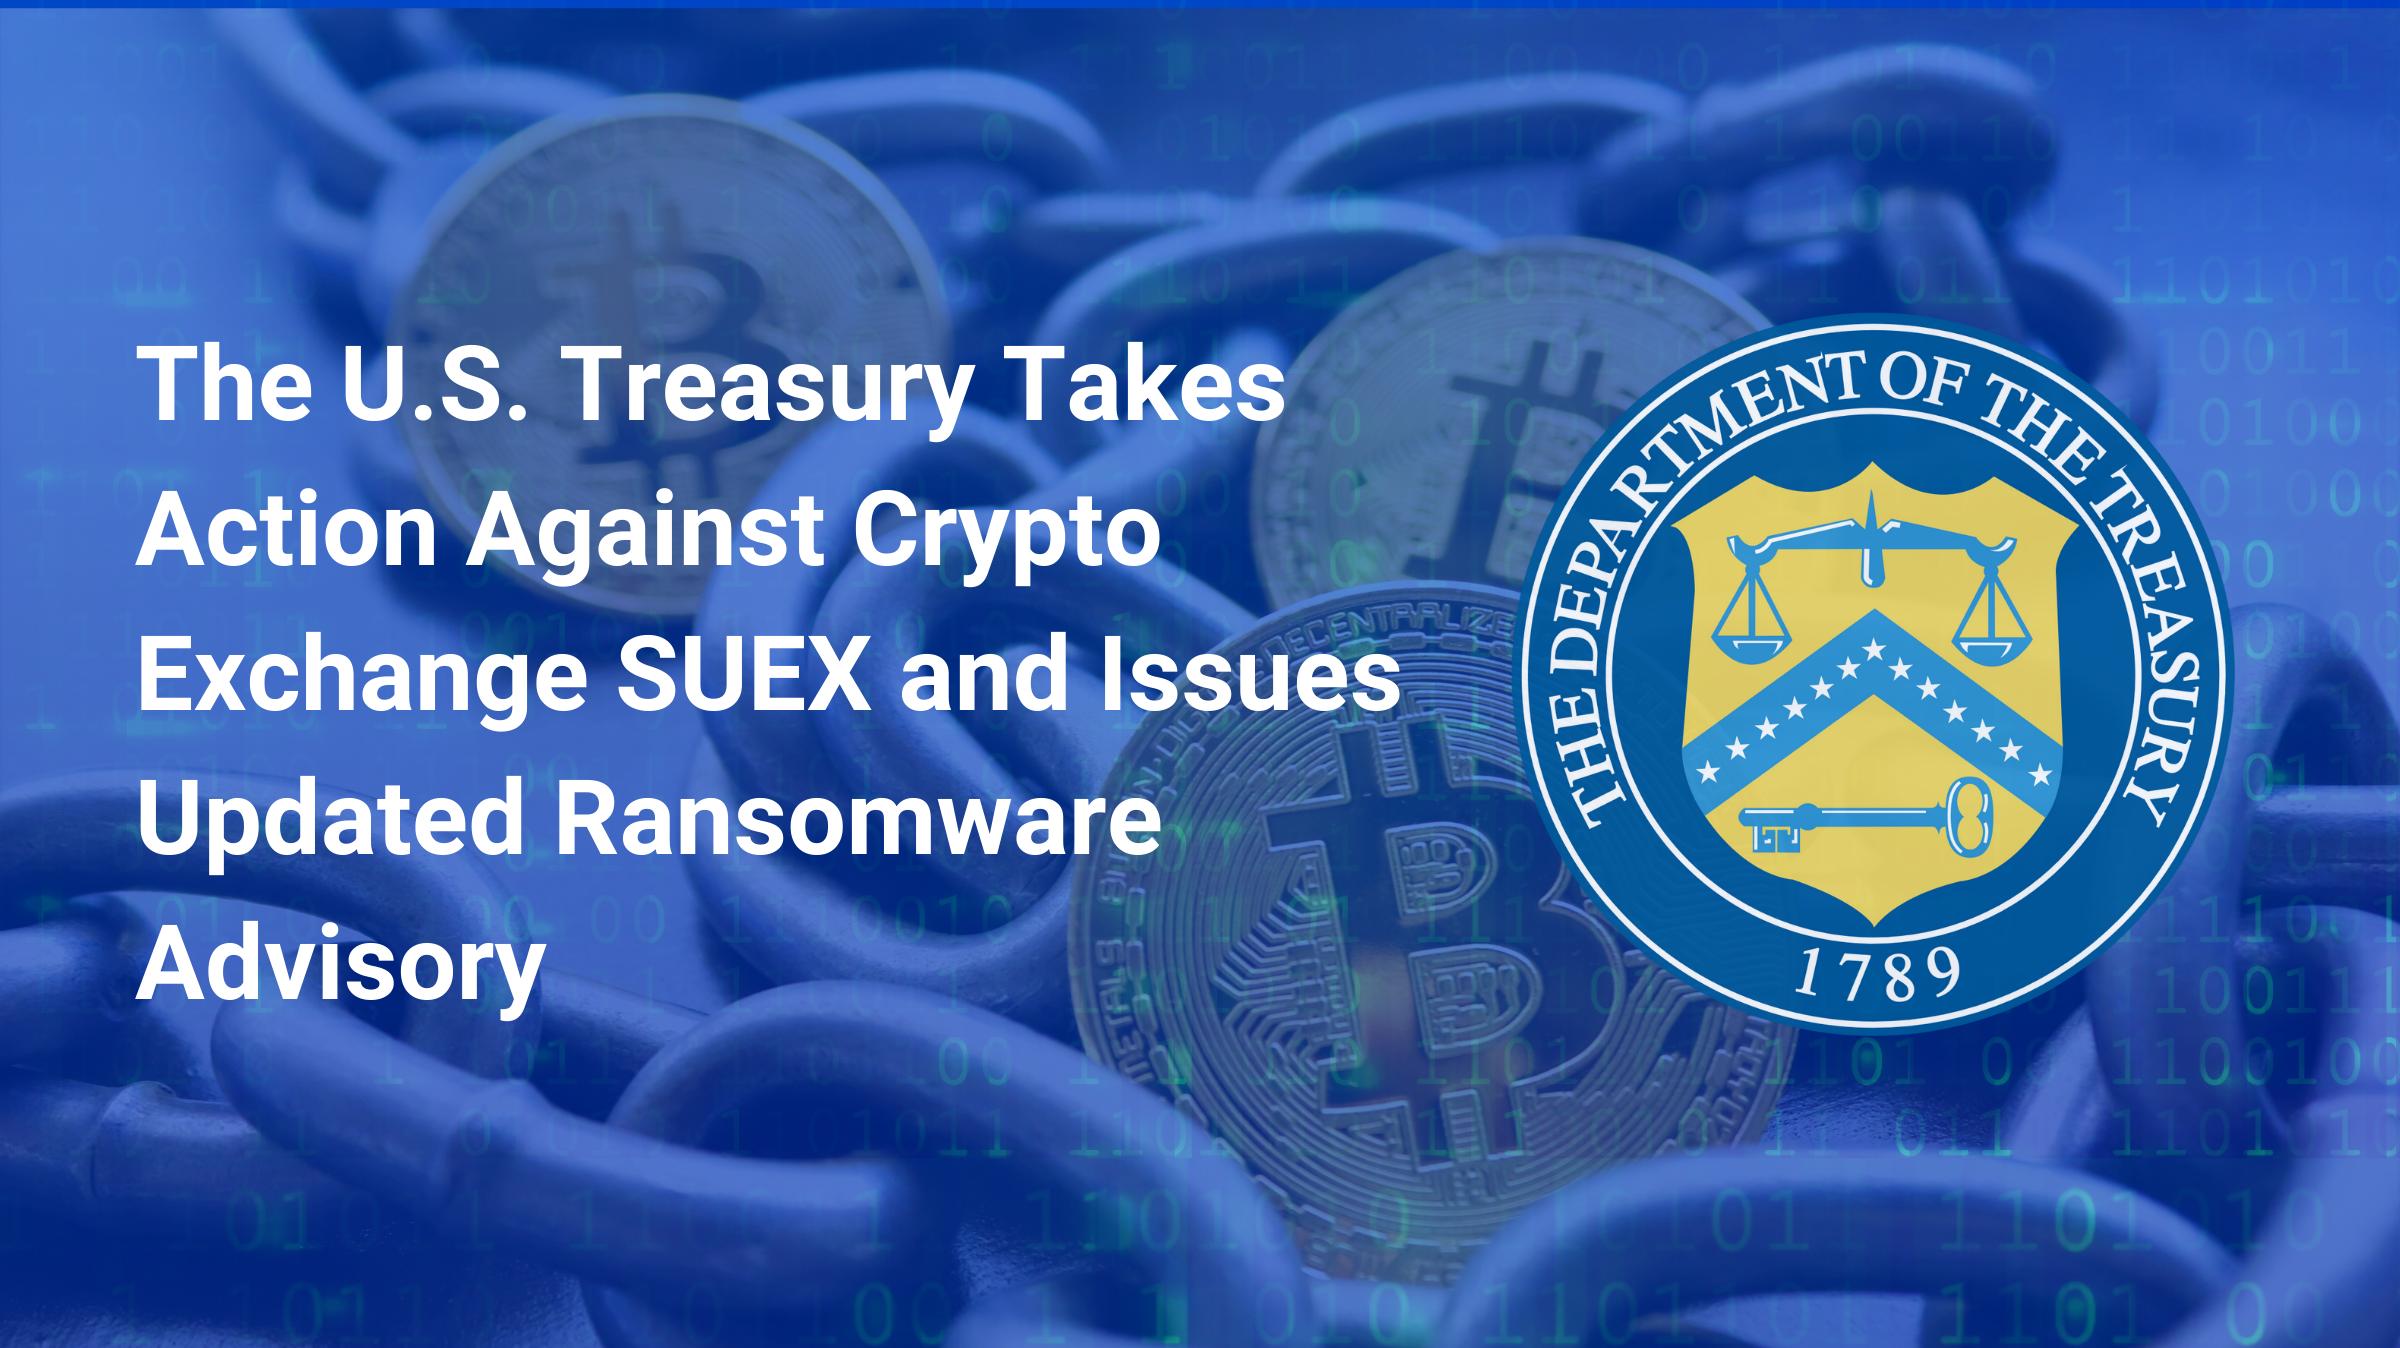 U.S. Treasury Sanctions SUEX OTC for Facilitating Ransomware Transactions